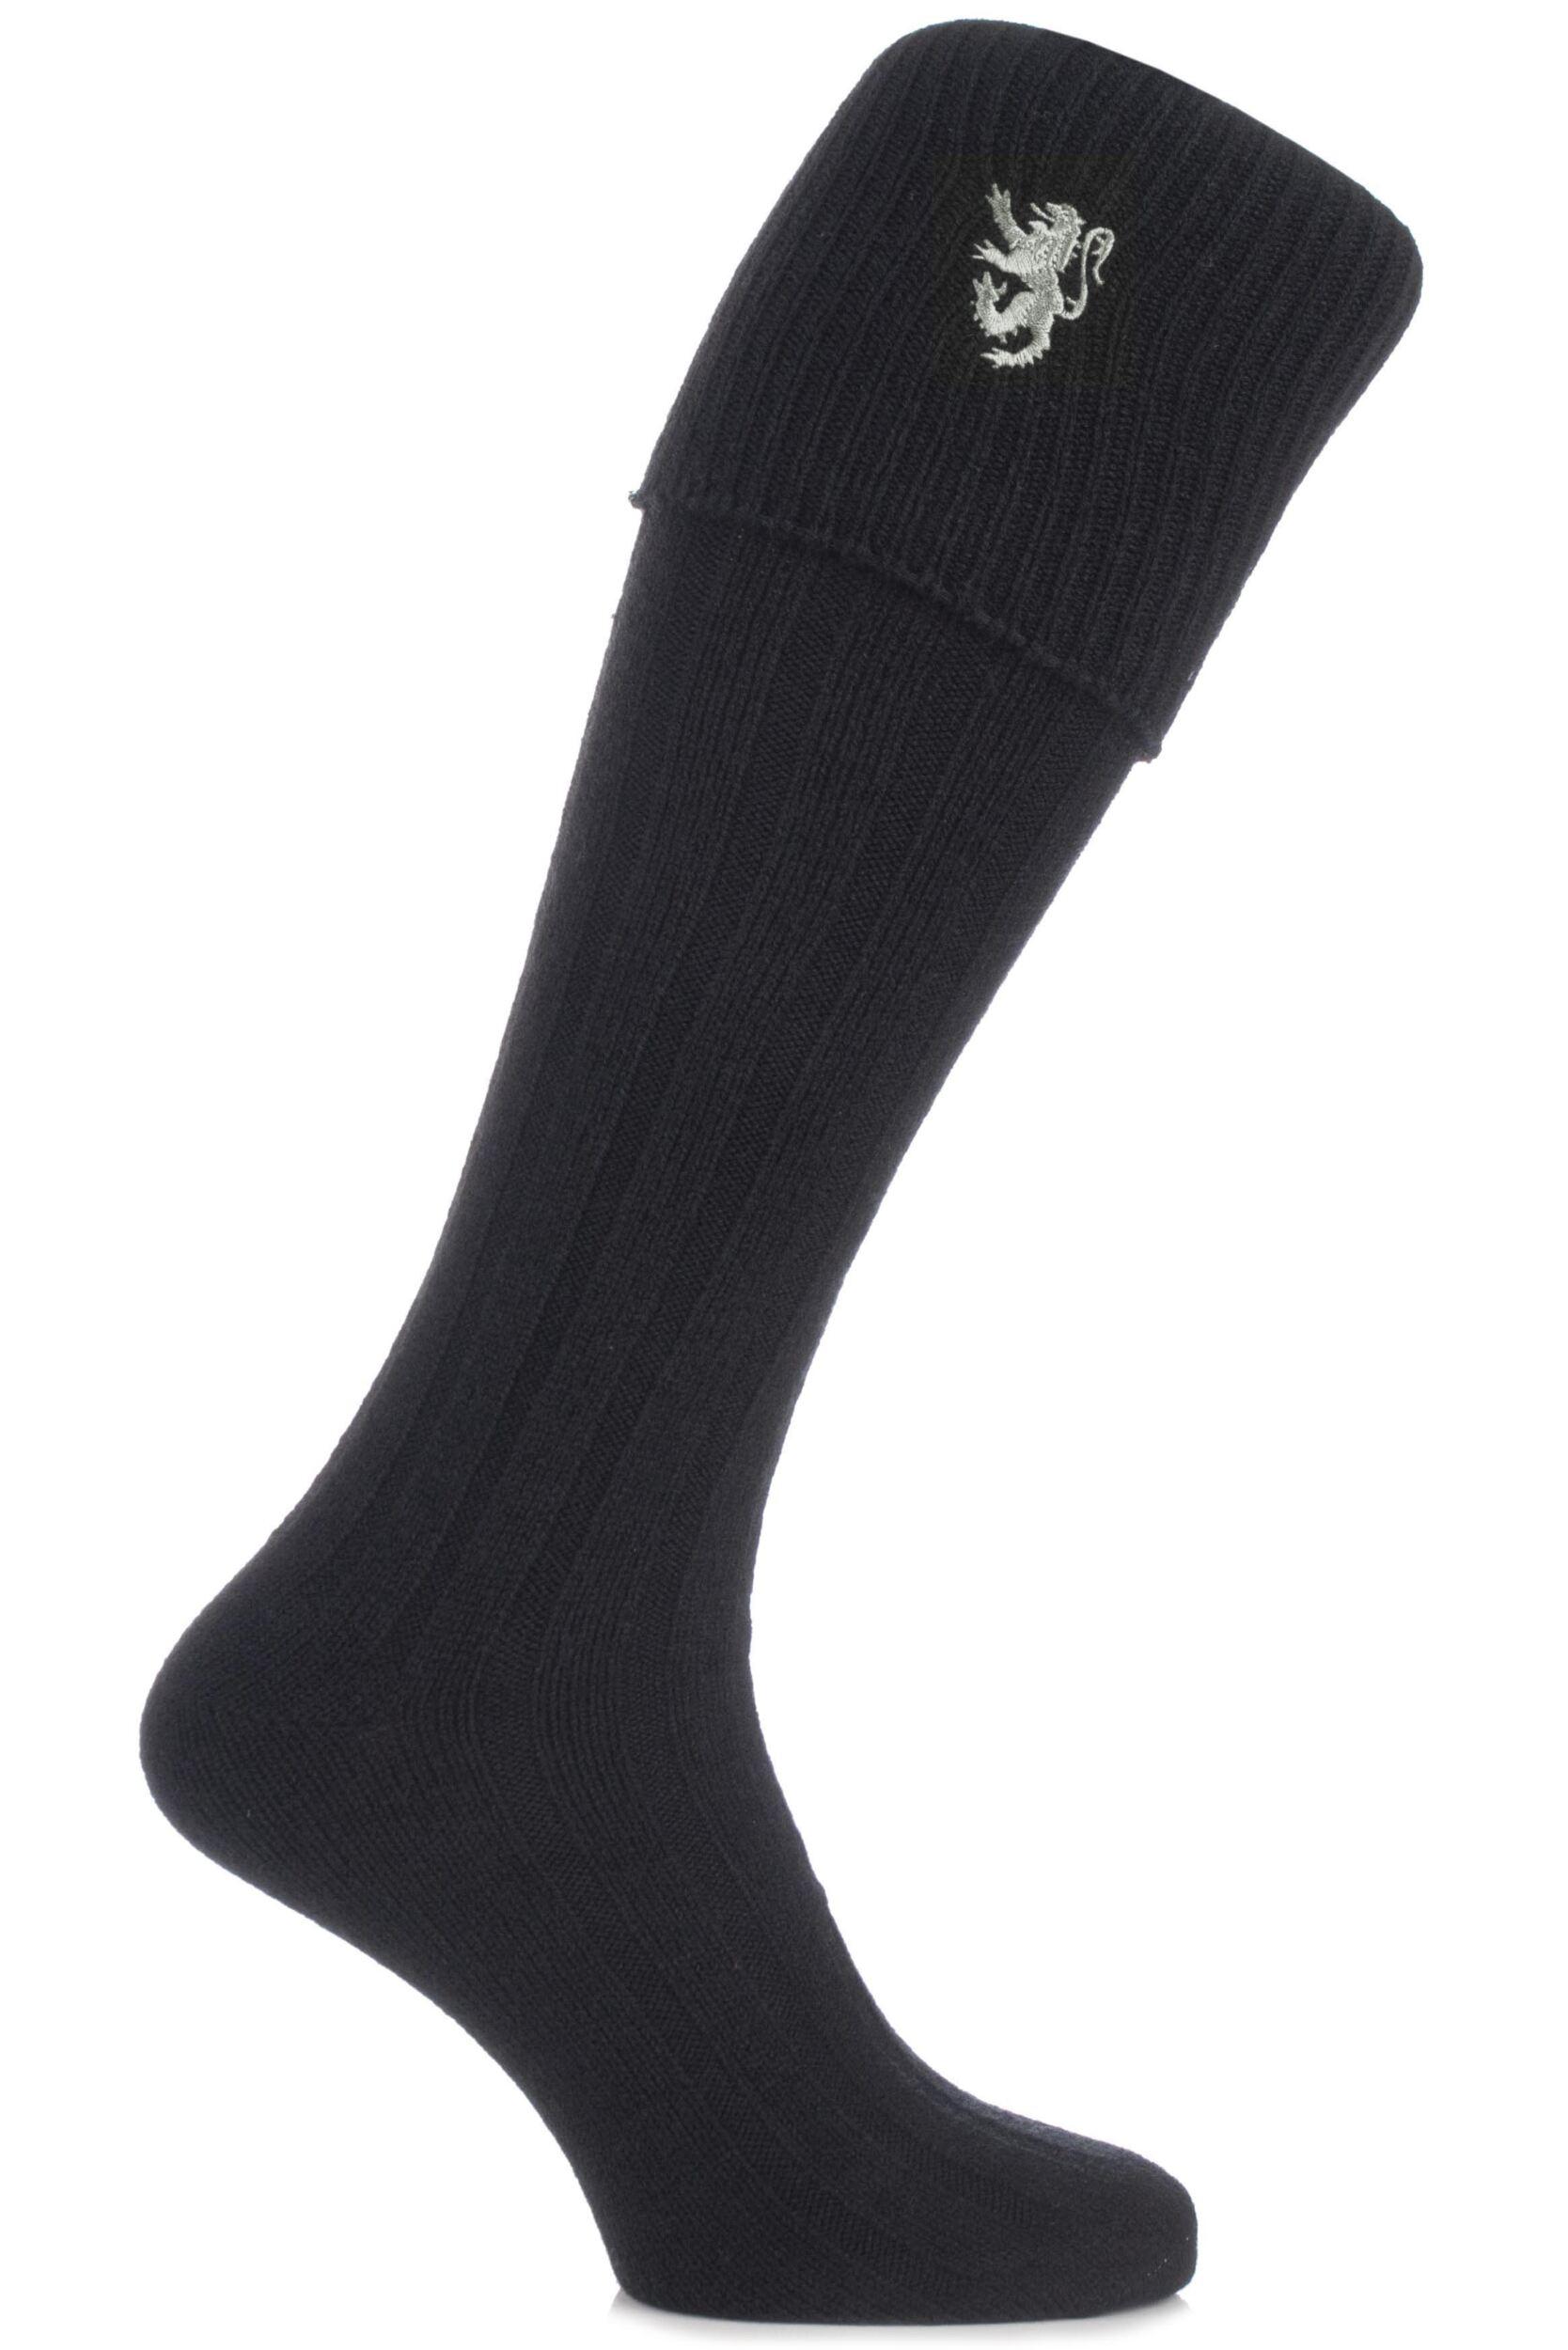 Mens 1 Pair HJ Hall Lion Rampant Wool Mix Kilt Socks